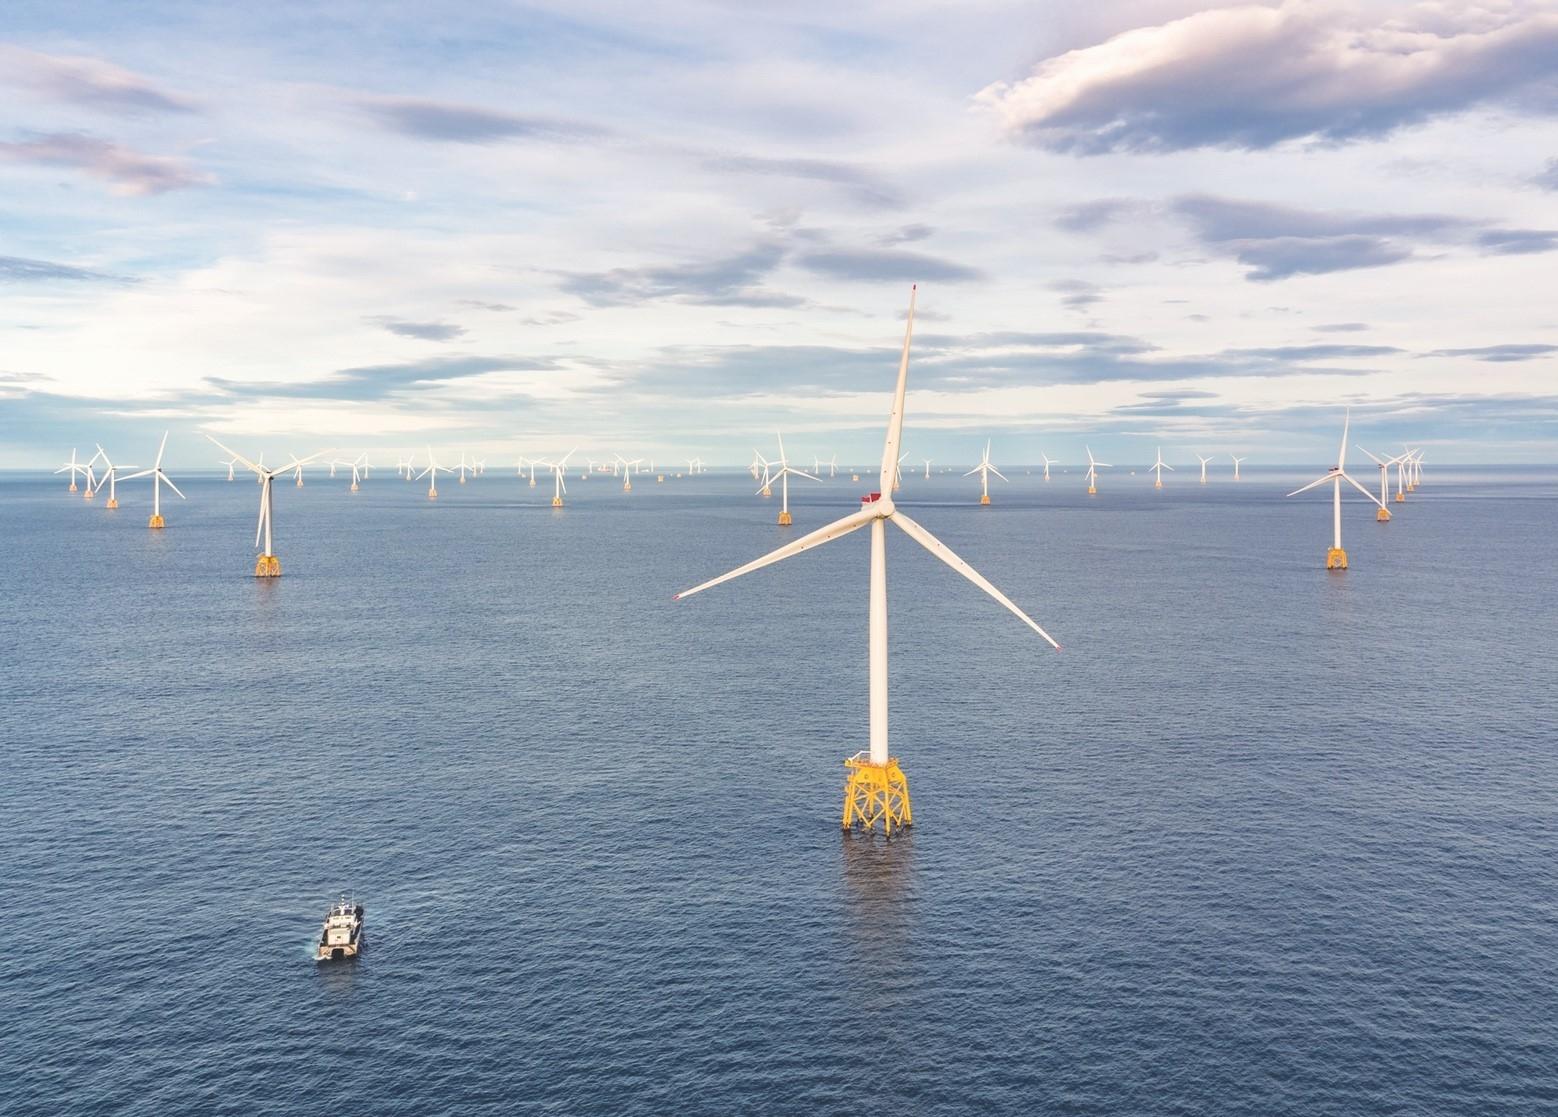 La Gan Offshore Wind Farm to create thousands of jobs